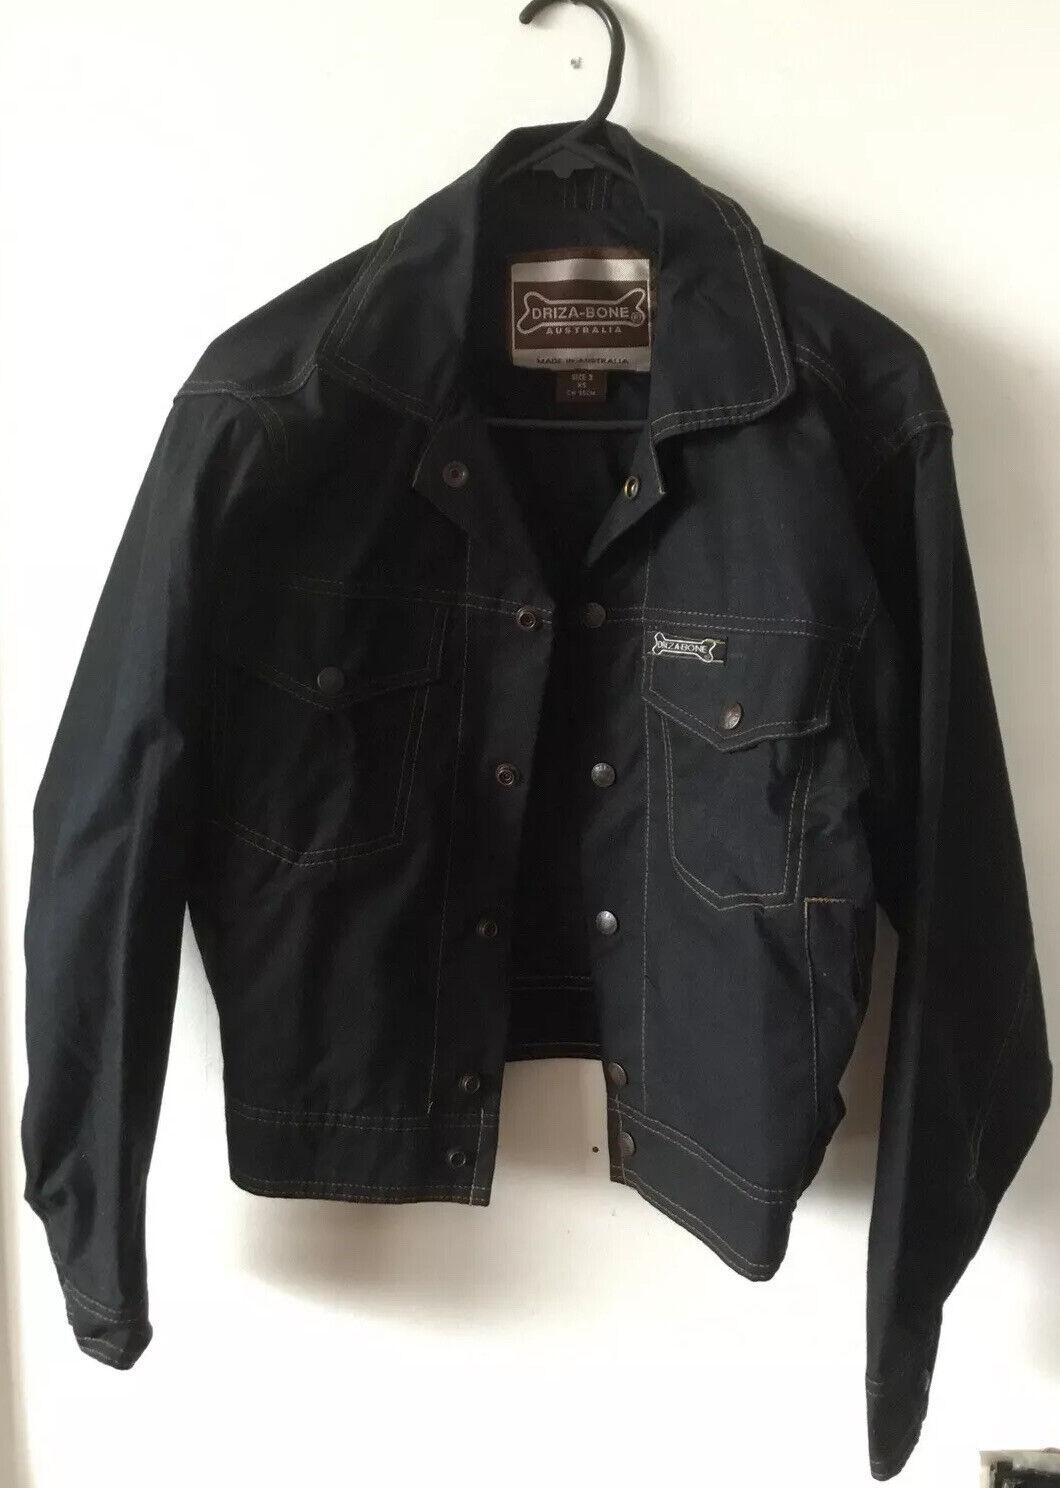 Fantastic New Driza Bone Cotton Oiled Jacket Size 3, Xs, Ch 95 Cm